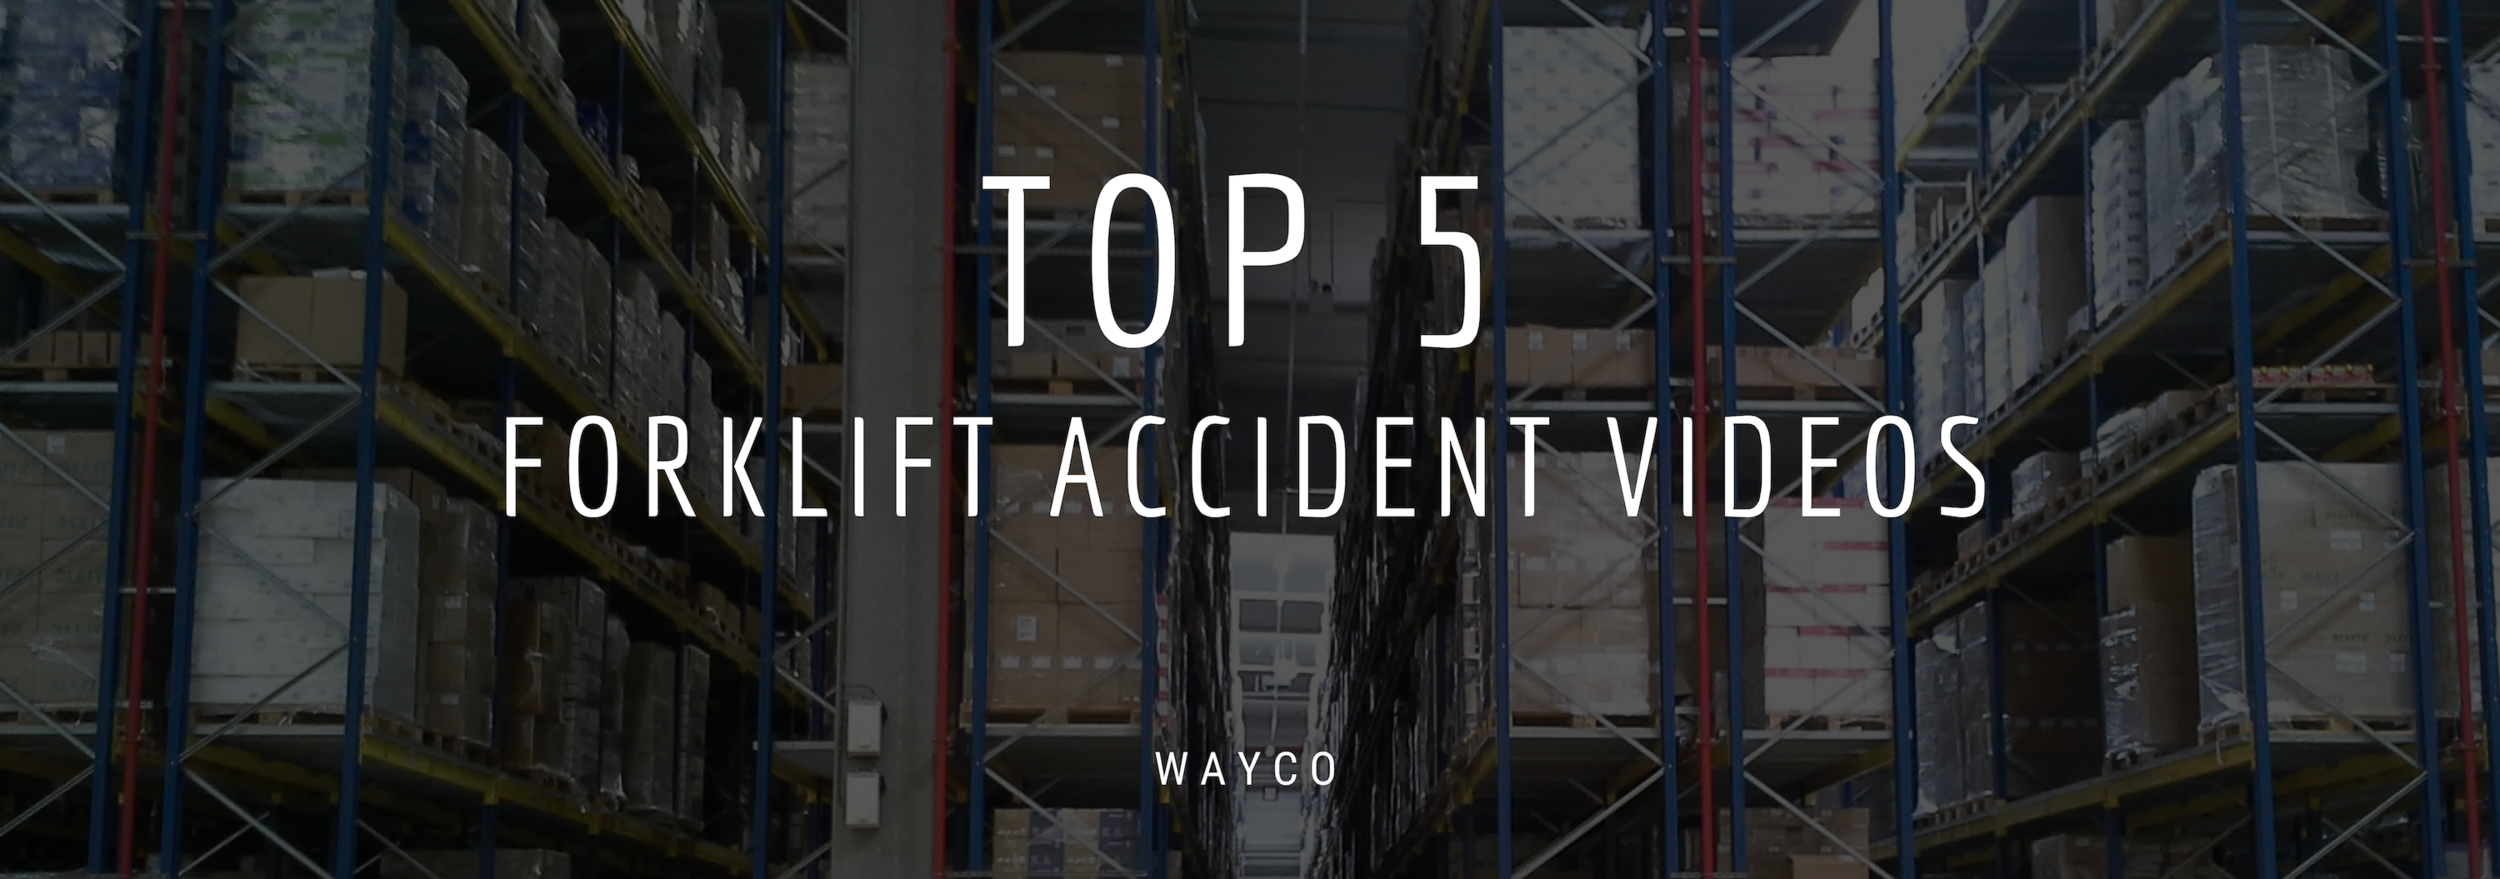 forklift accident videos.png